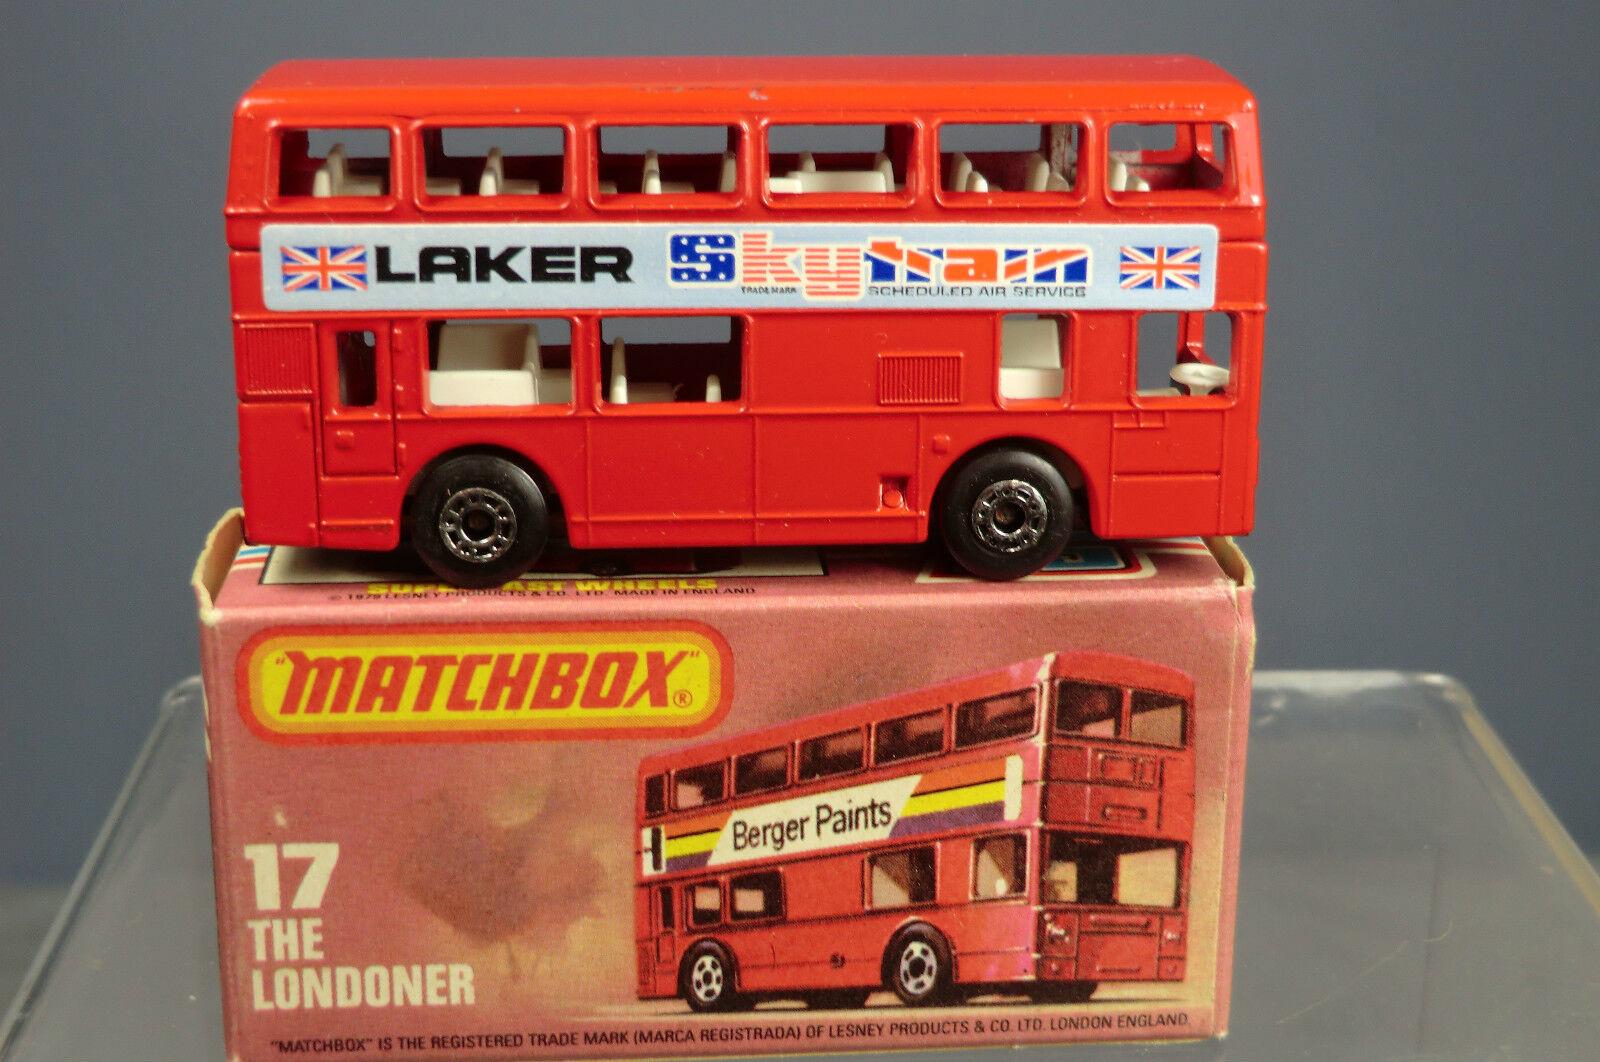 MATCHBOX SUPERFAST MODEL No.17G  LAKER SKY TRAIN   TITAN LONDON BUS   MIB